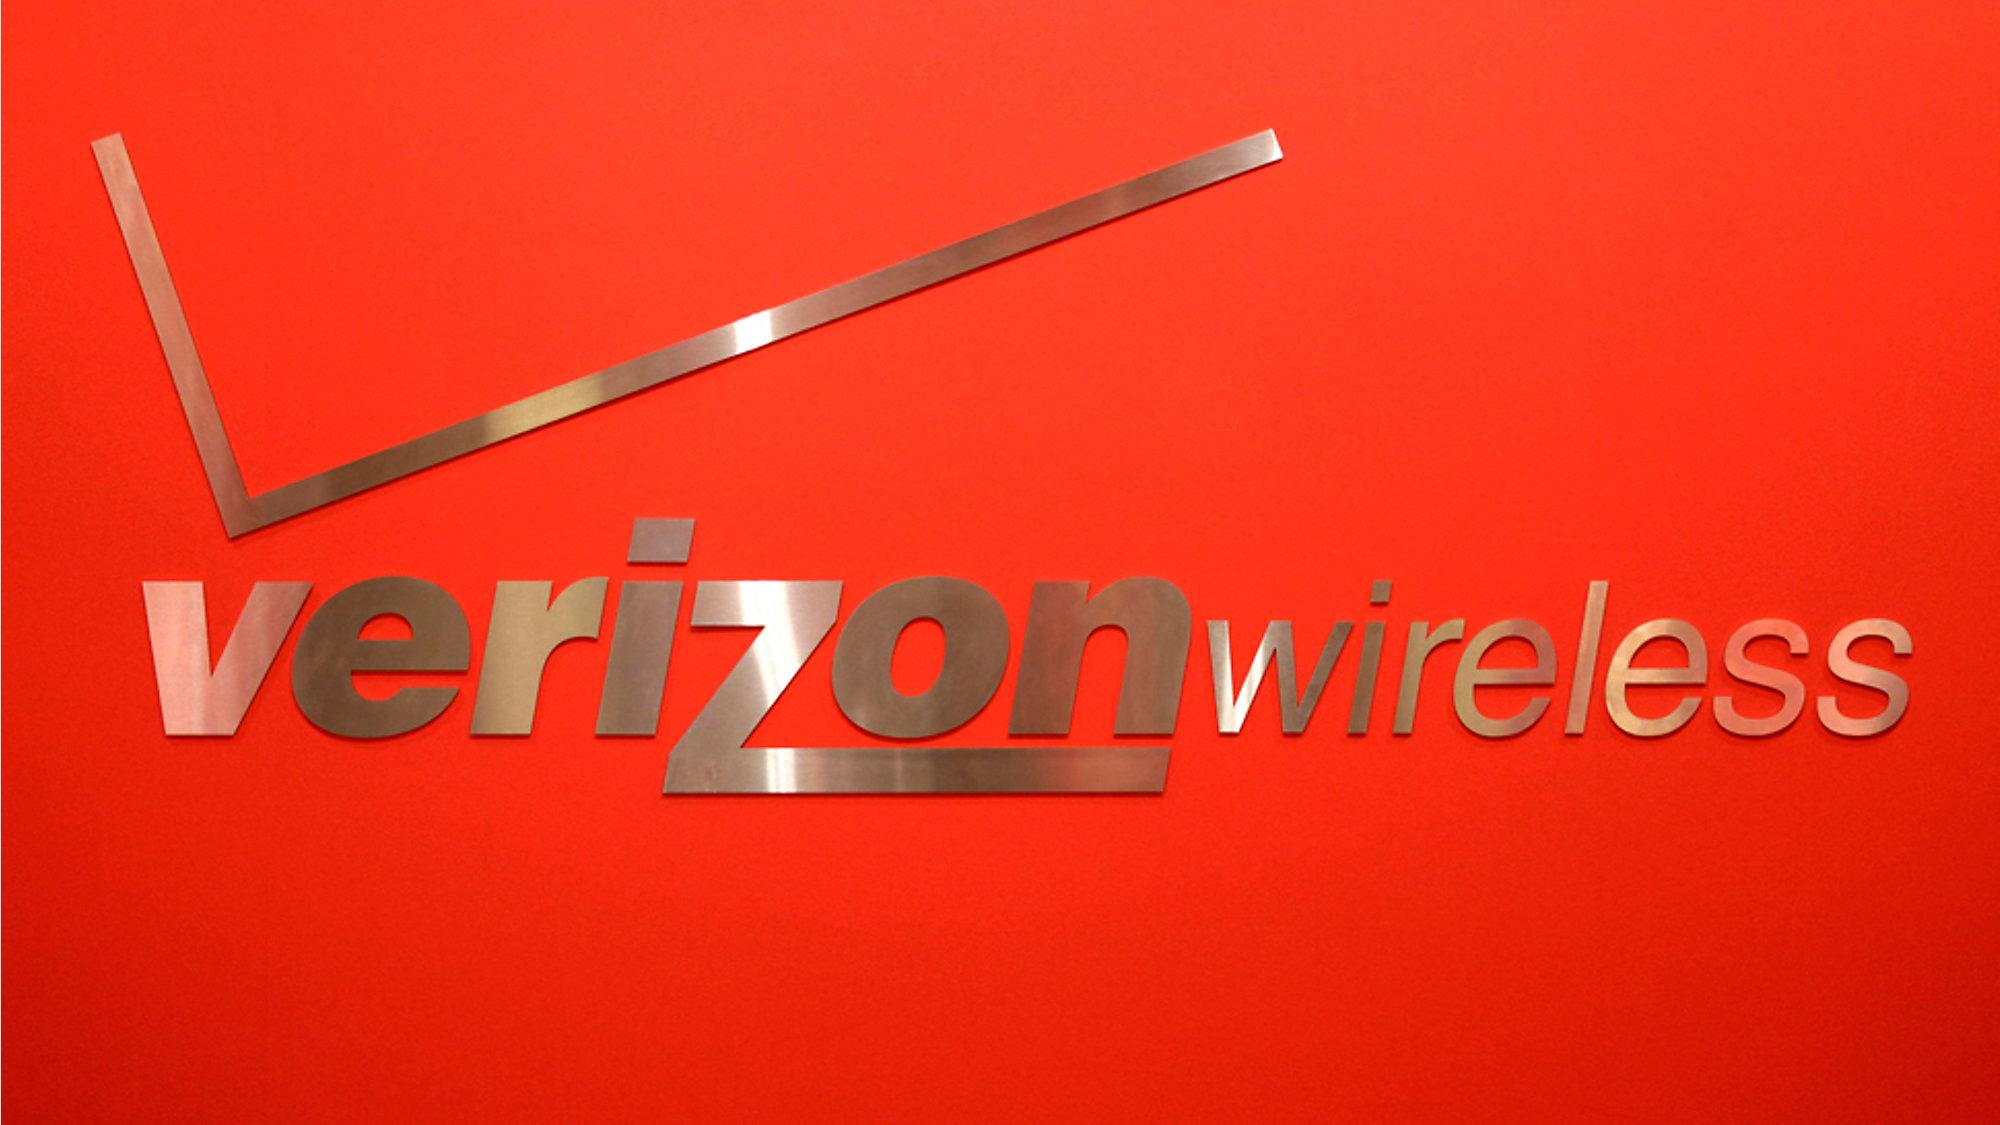 Bay area Verizon service restored